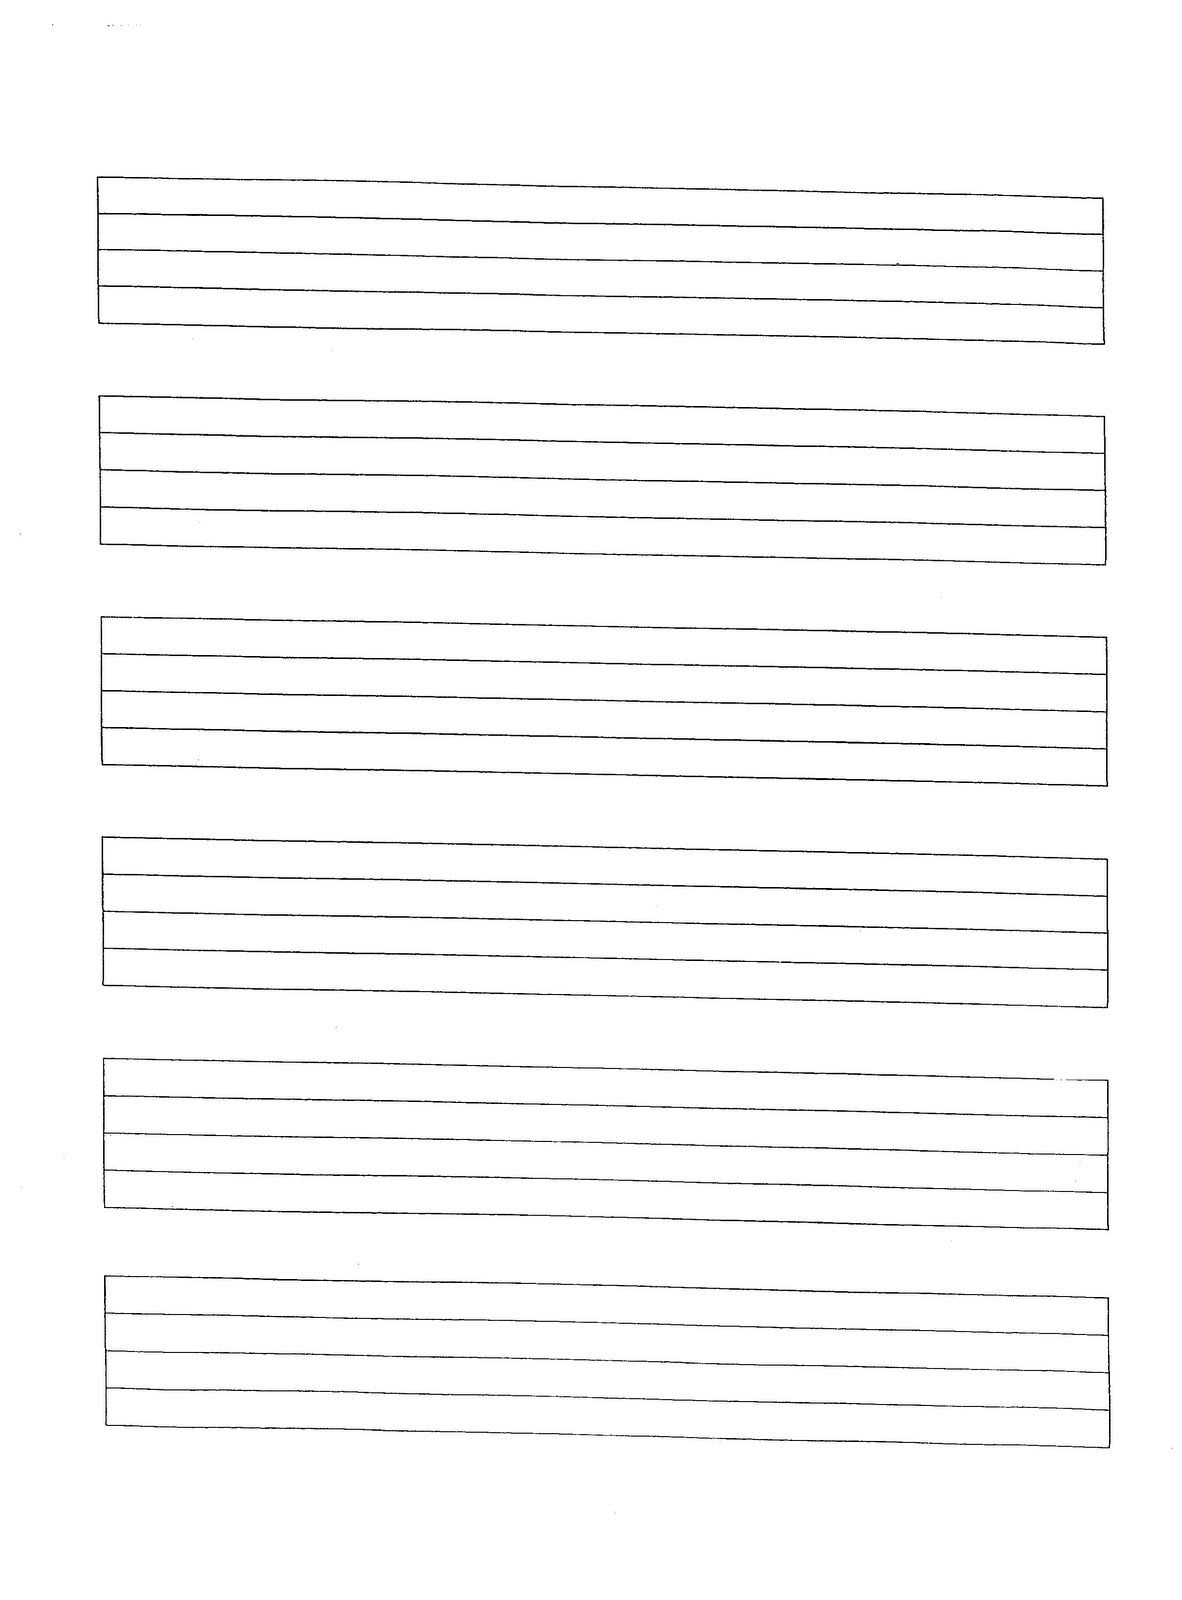 Print At 150% - Staff Paper | Miss Jacobson's Music: Manuscript - Free Printable Staff Paper